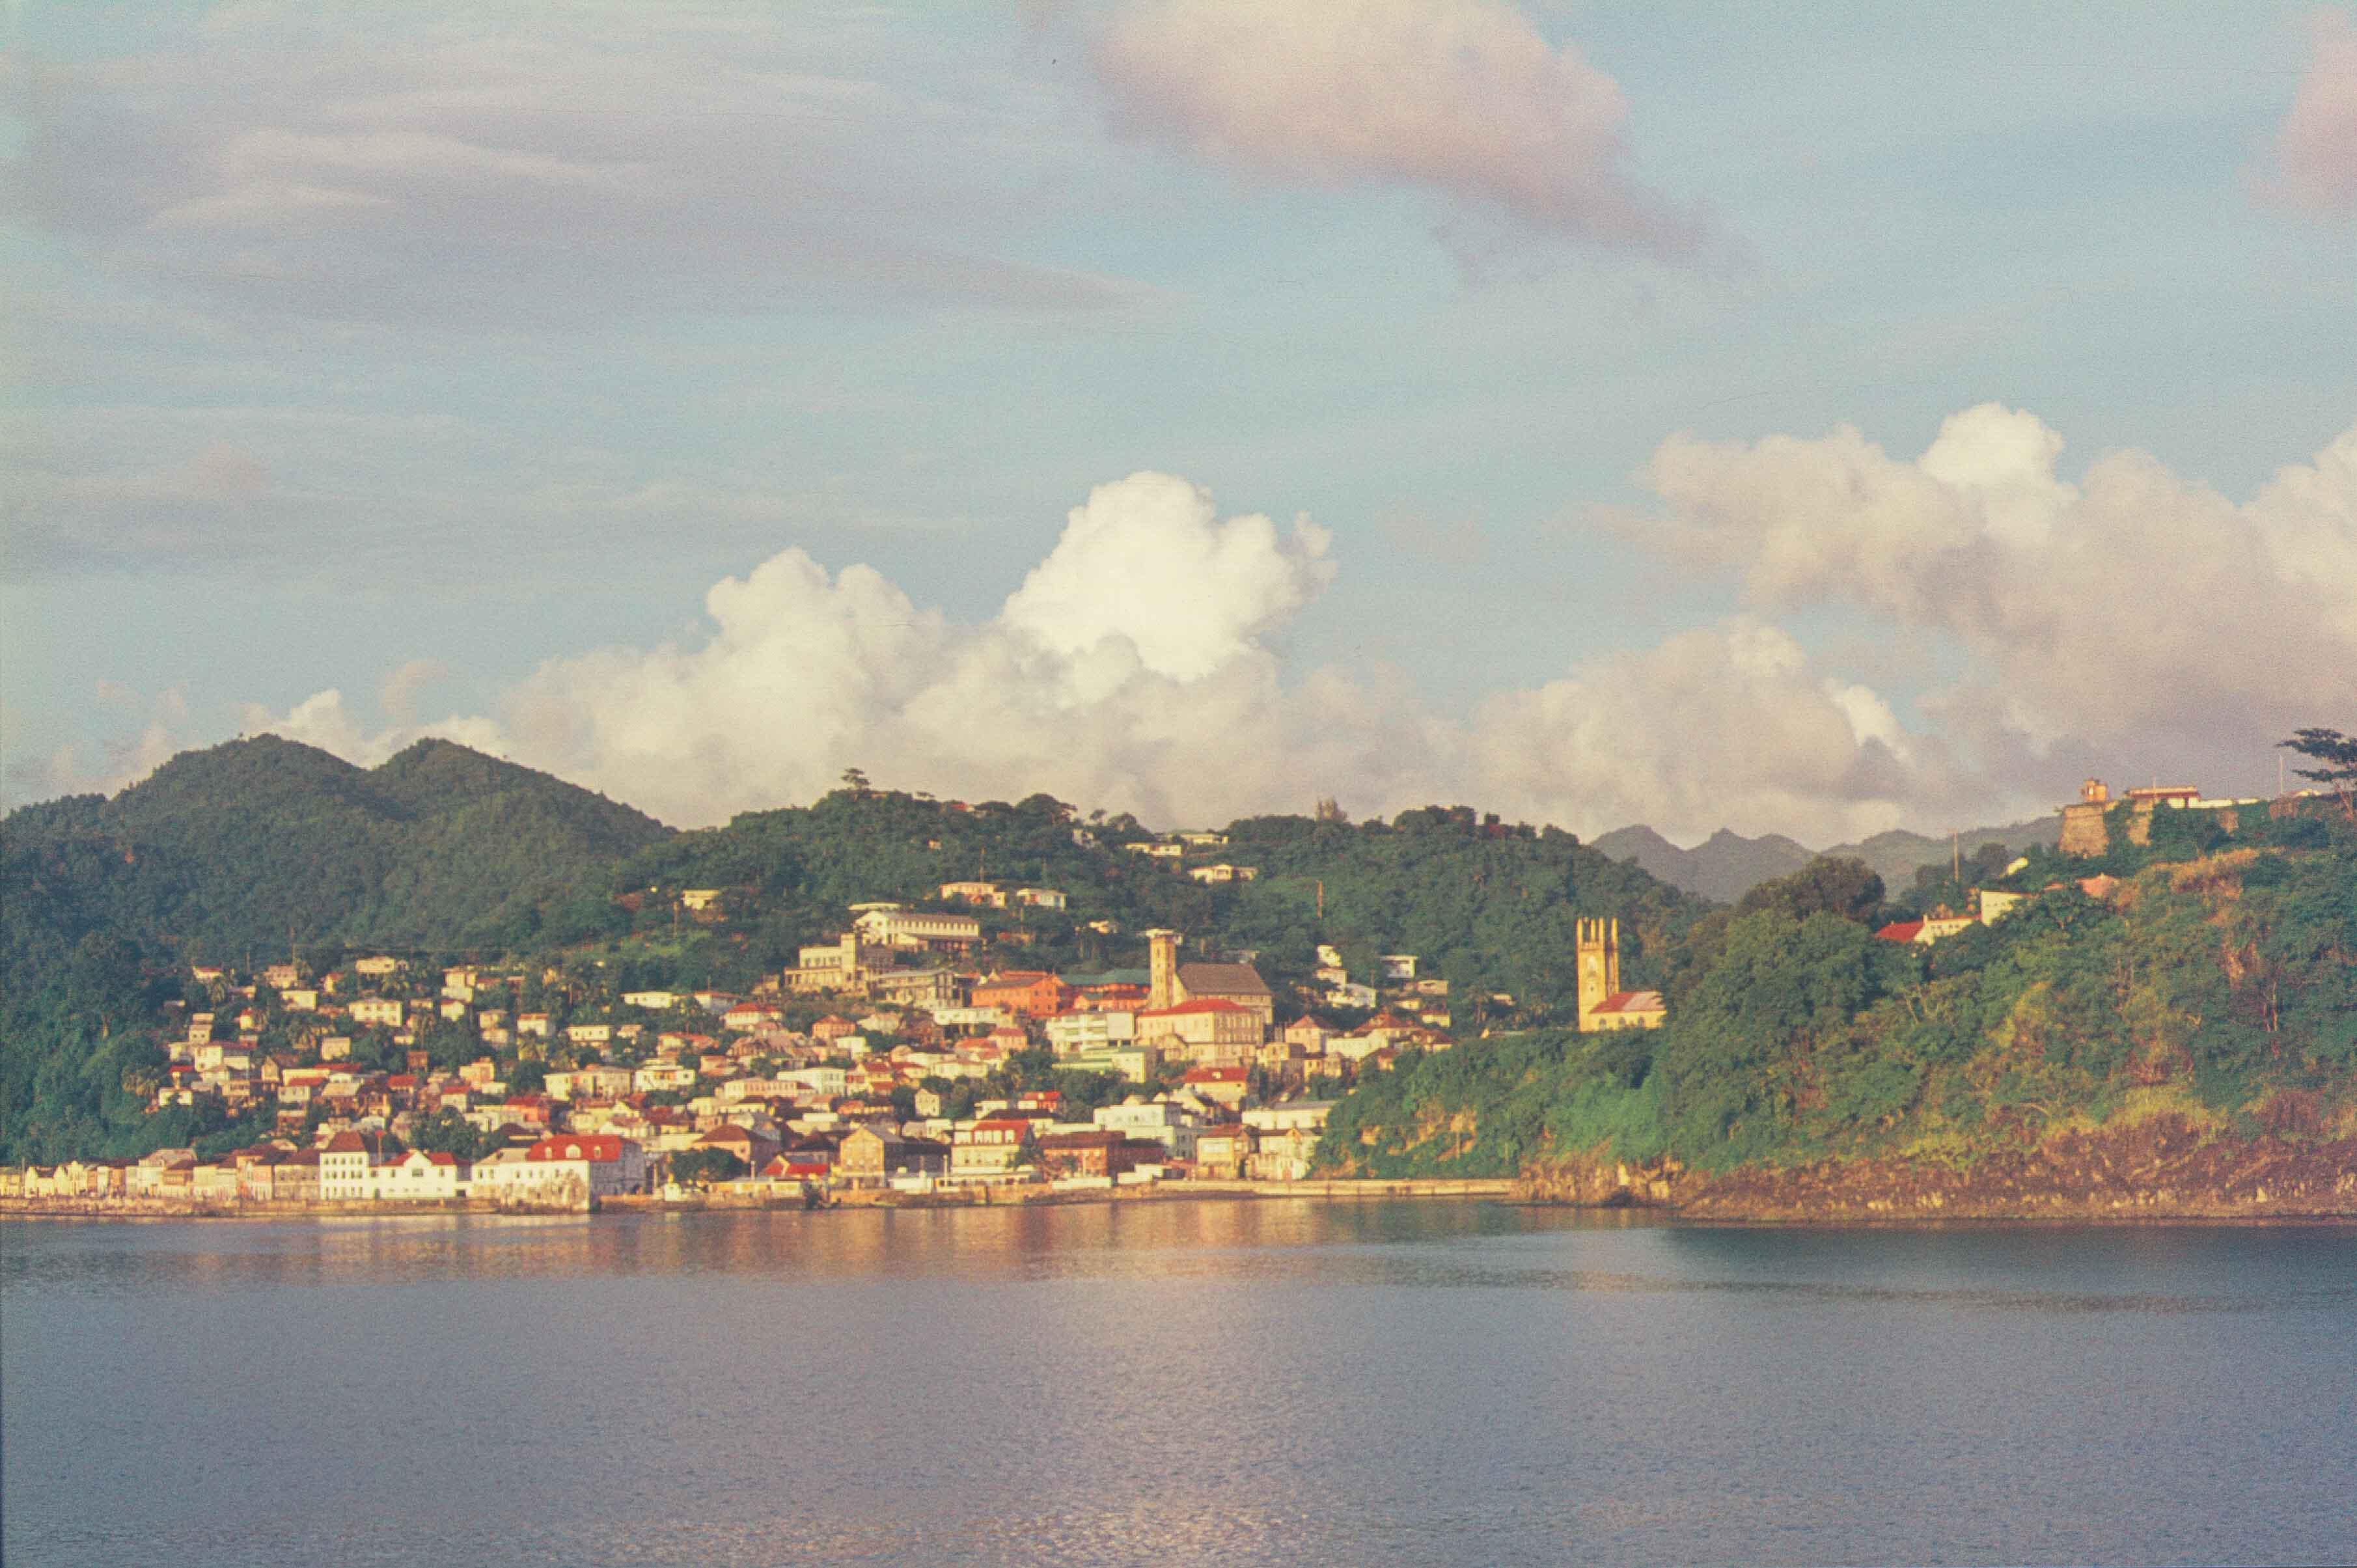 603. Suriname